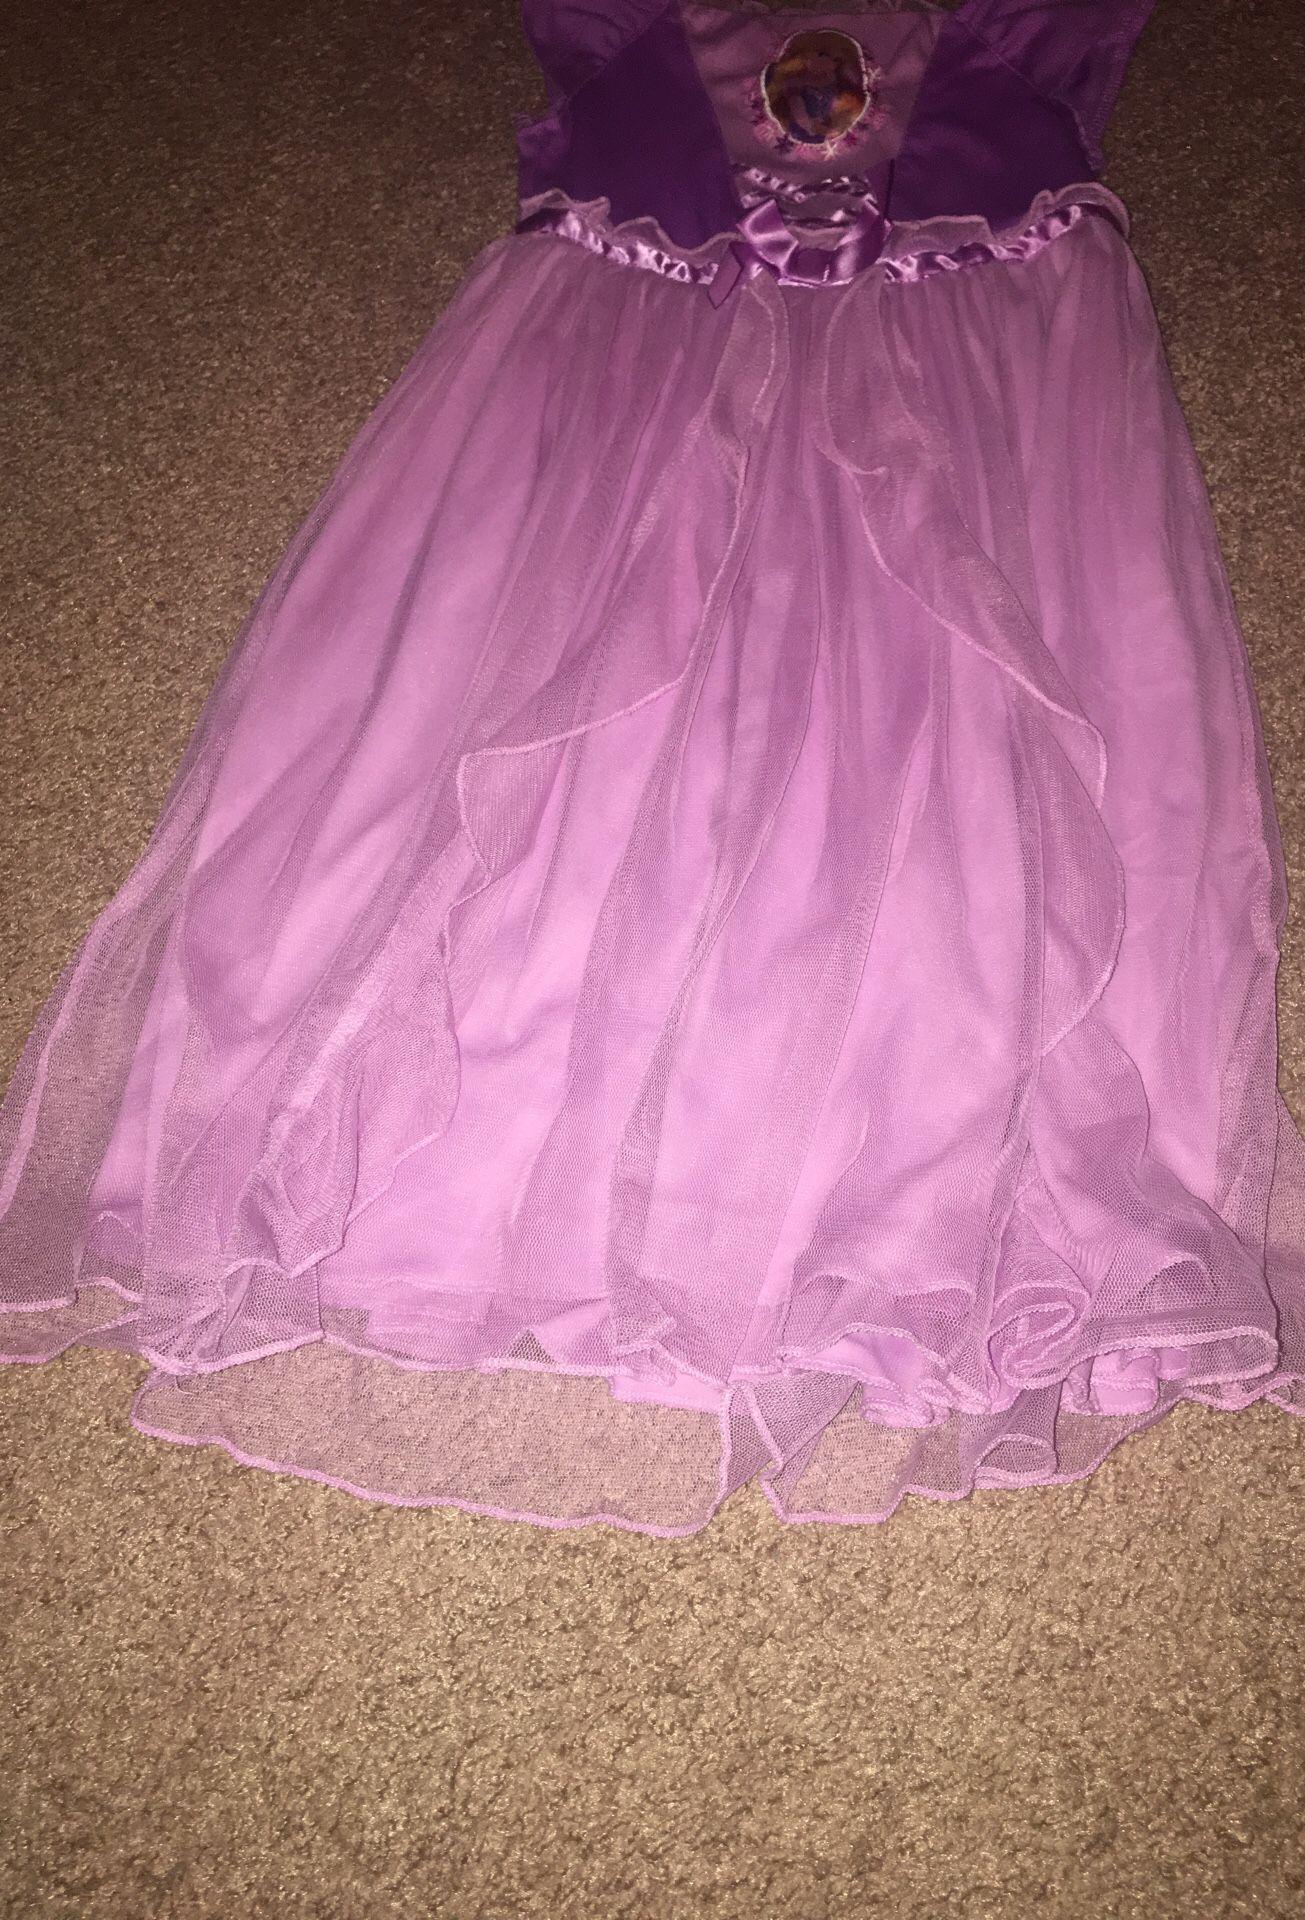 Disney rapunzel dress/night gown